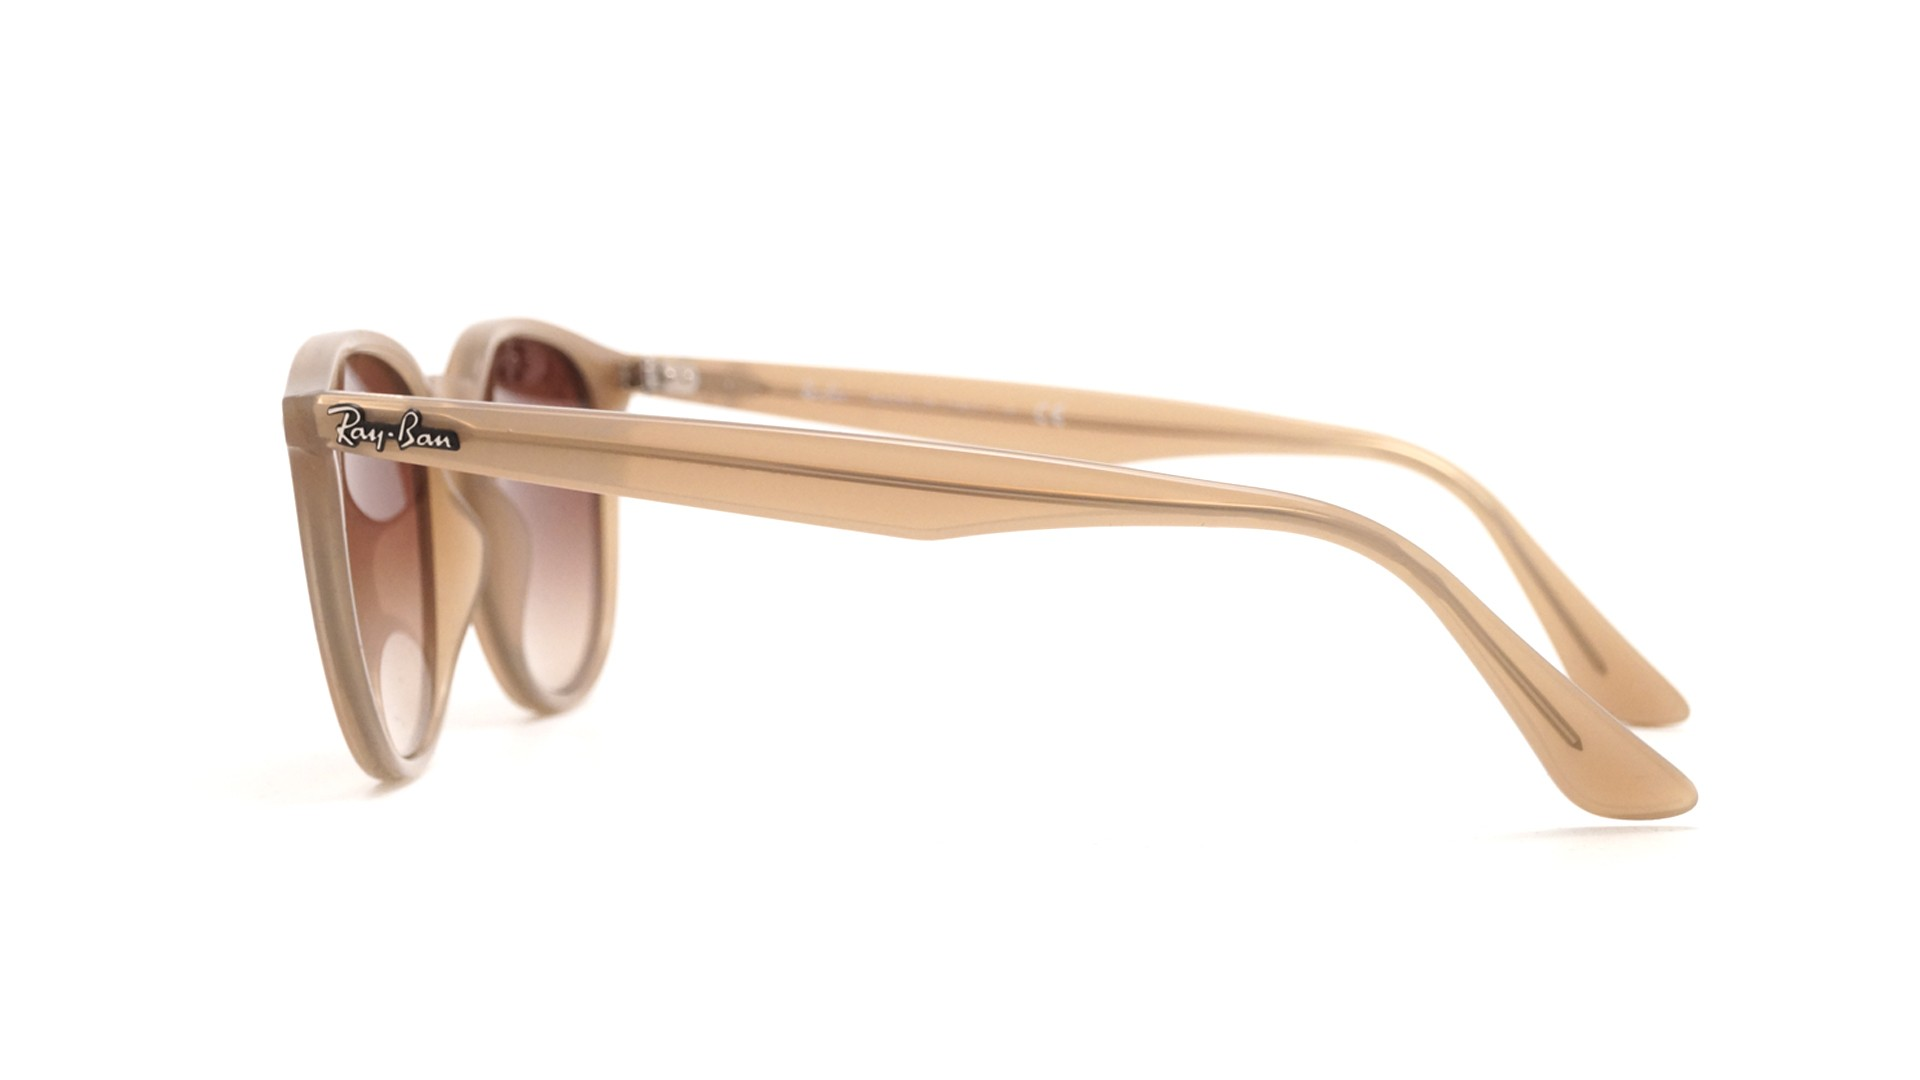 NEW Ray Ban RB4259 616613 51 Shiny Opal Beige Mens Womens Sunglasses Glasses a4664fff05ee